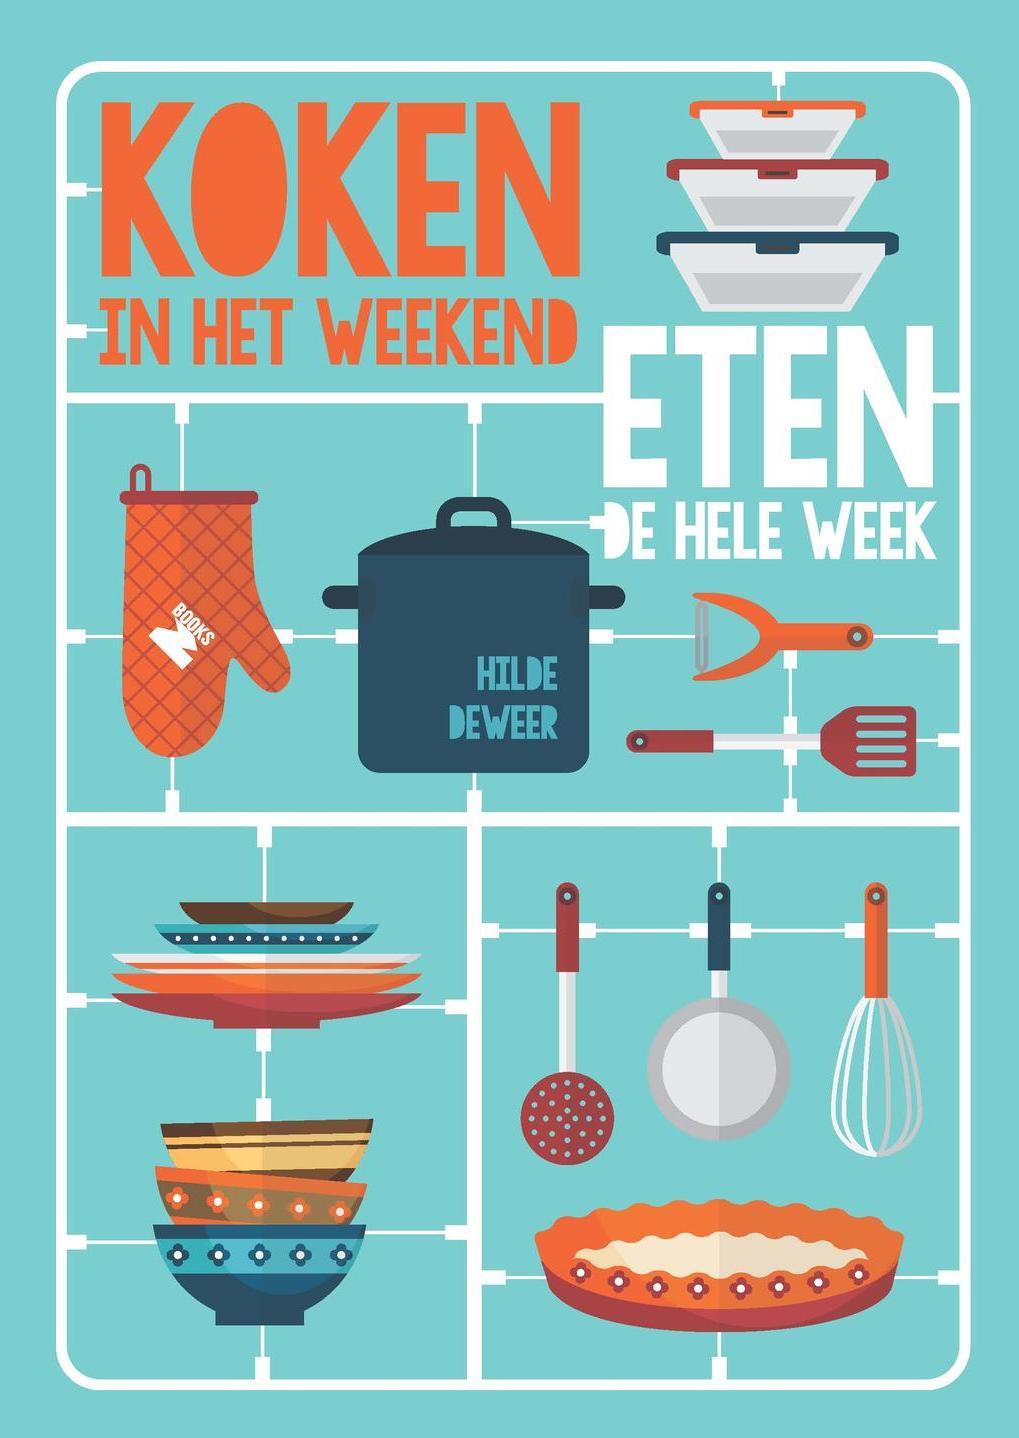 HD-koken-weekend-cover-.jpg